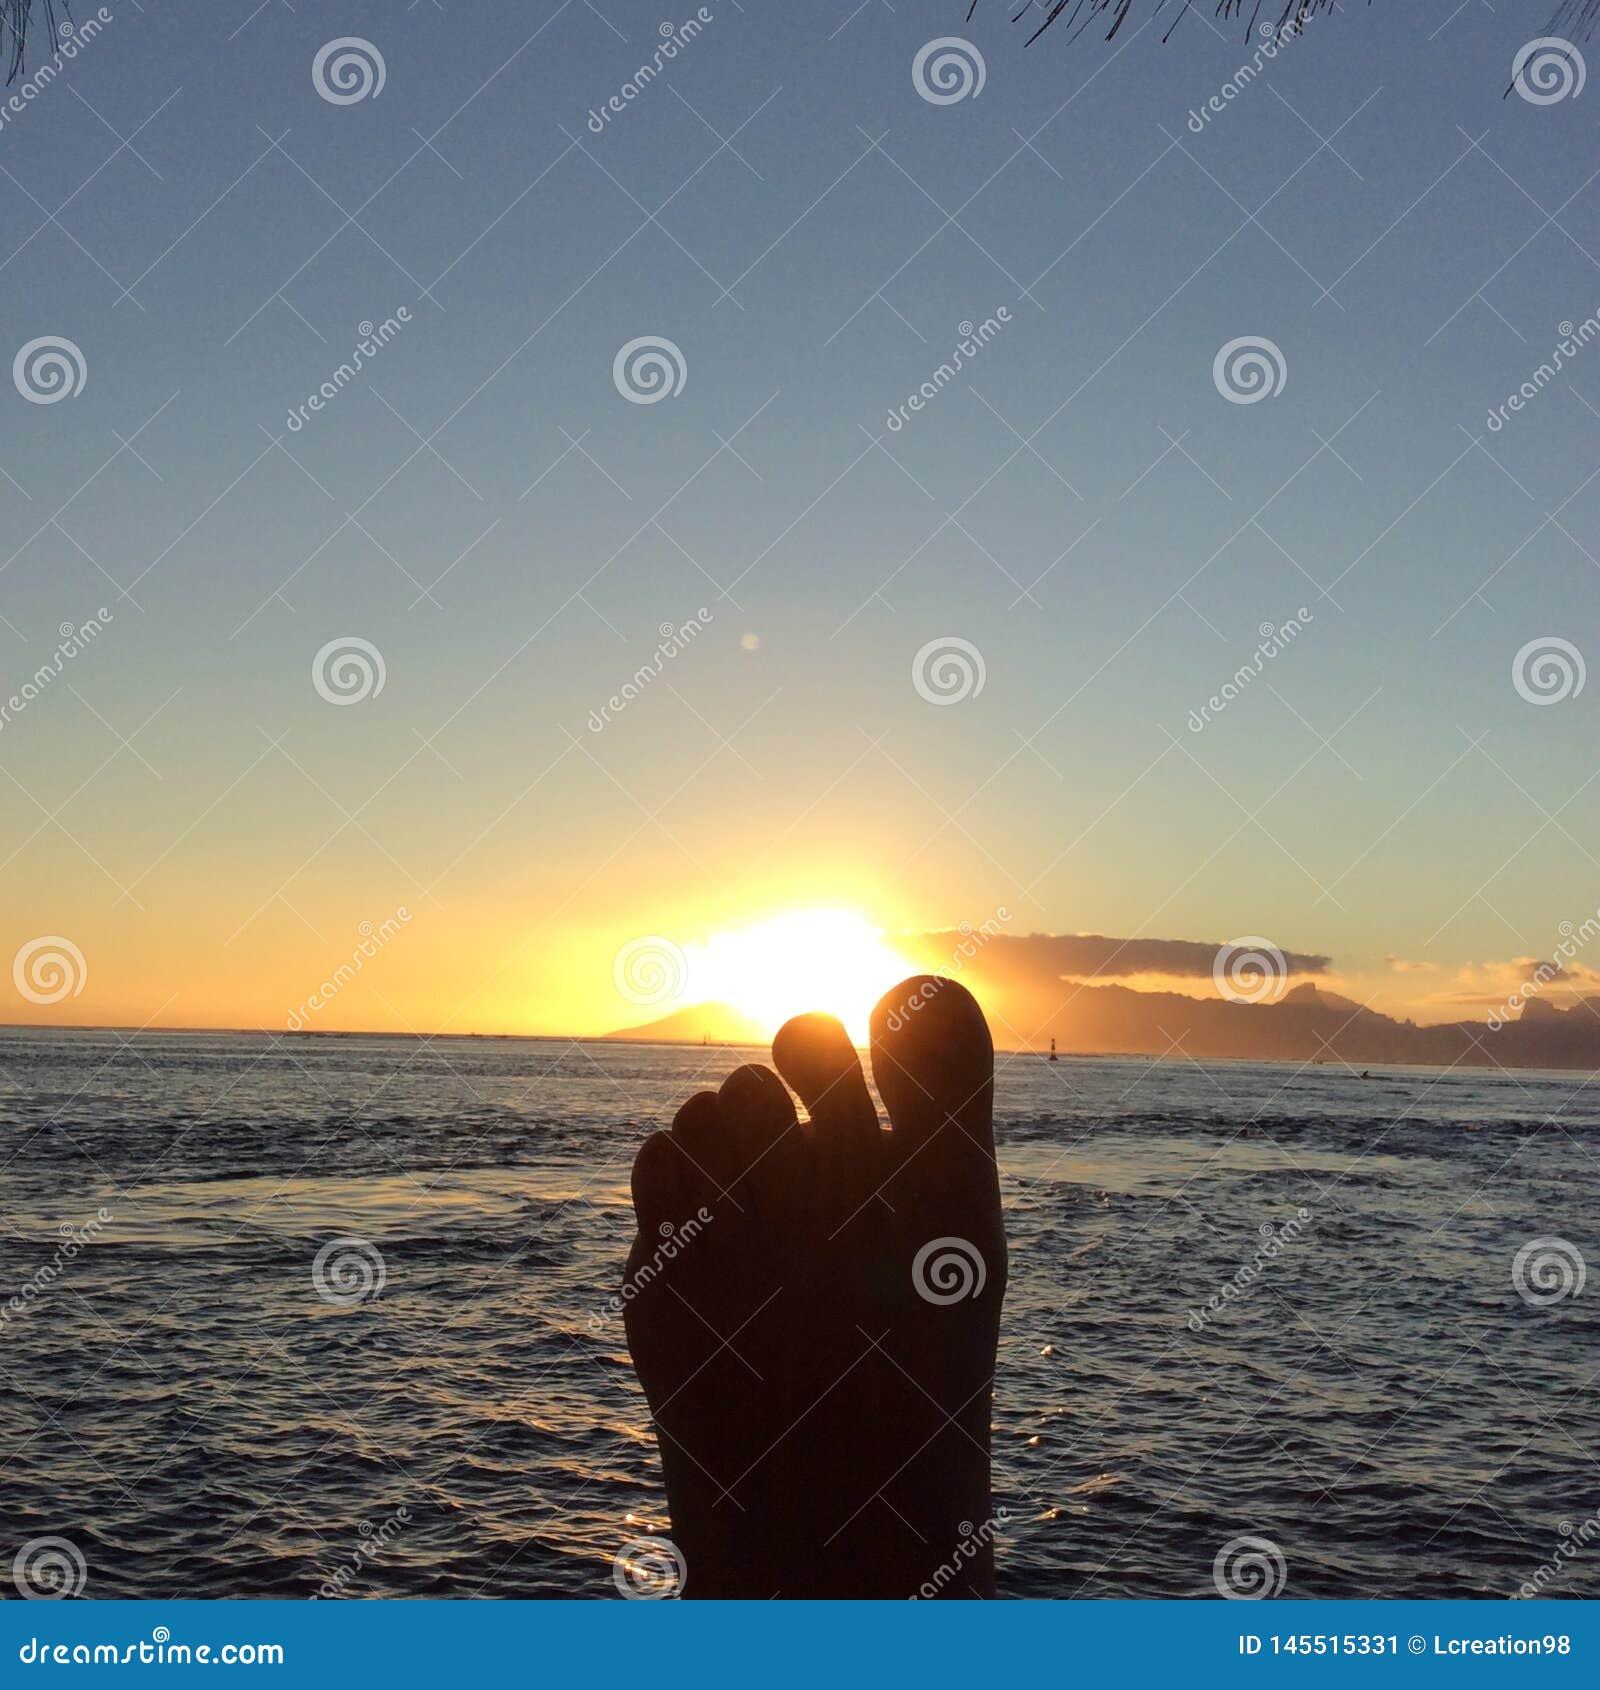 Sunshine and foot